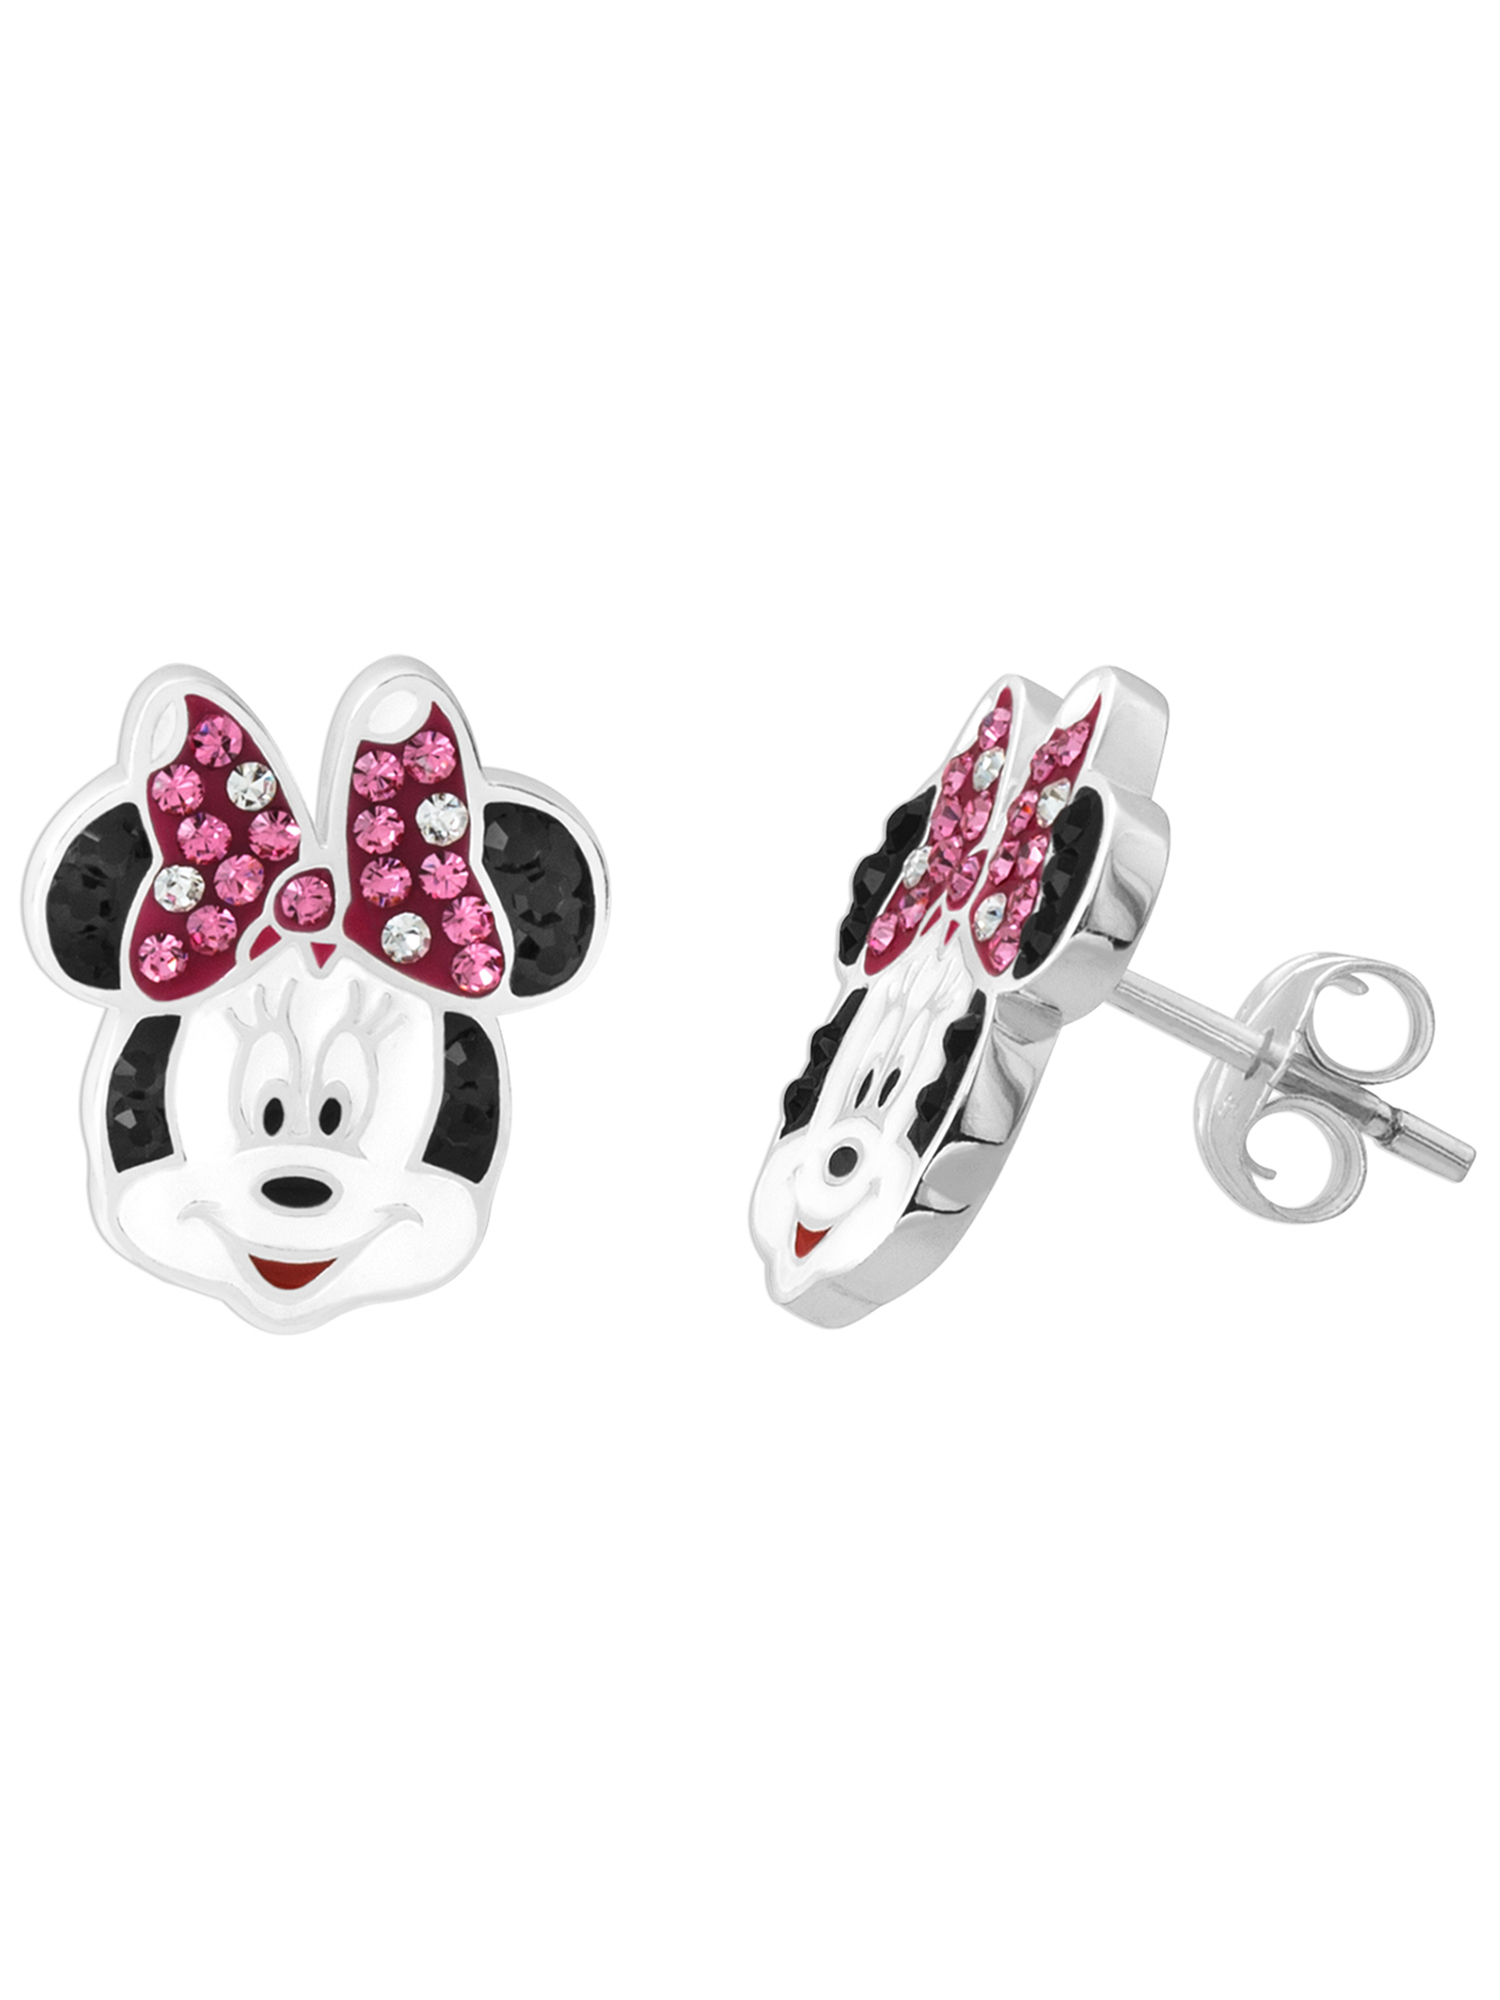 mouse earrings kids earrings mouse character earrings Mouse ears earrings cartoom earrings cartoon character earrings stud earrings